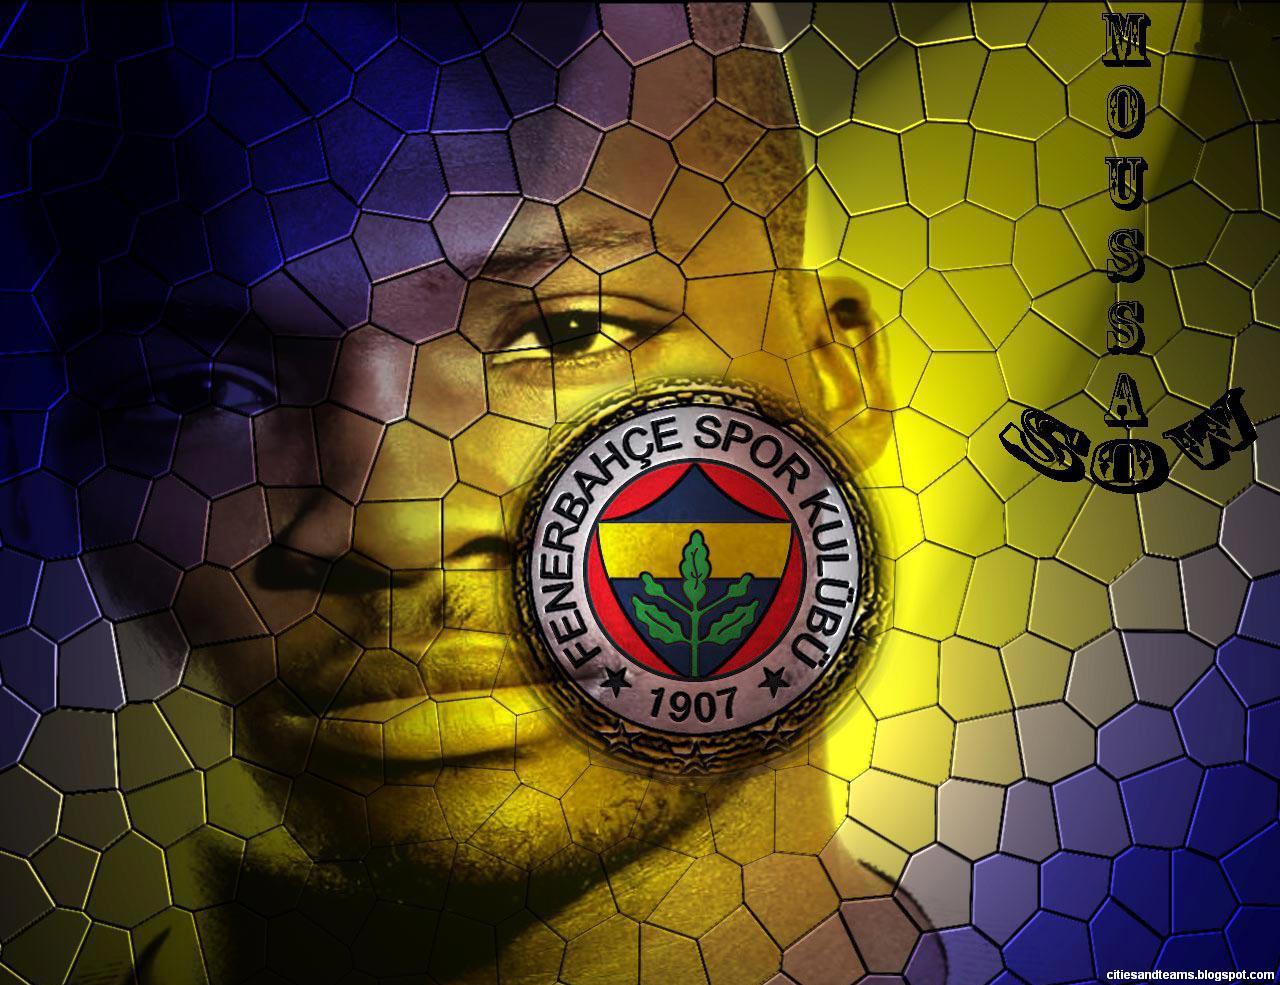 http://2.bp.blogspot.com/-PWdQlBa0-24/UM0P7JEhLuI/AAAAAAAAIx8/S327L_r6iEI/s1600/Moussa_Sow_Senegalese_Goal_Machine_Super_Striker_Fenerbahce_Turkey_Hd_Desktop_Wallpaper_4_citiesandteams.blogspot.com.jpg